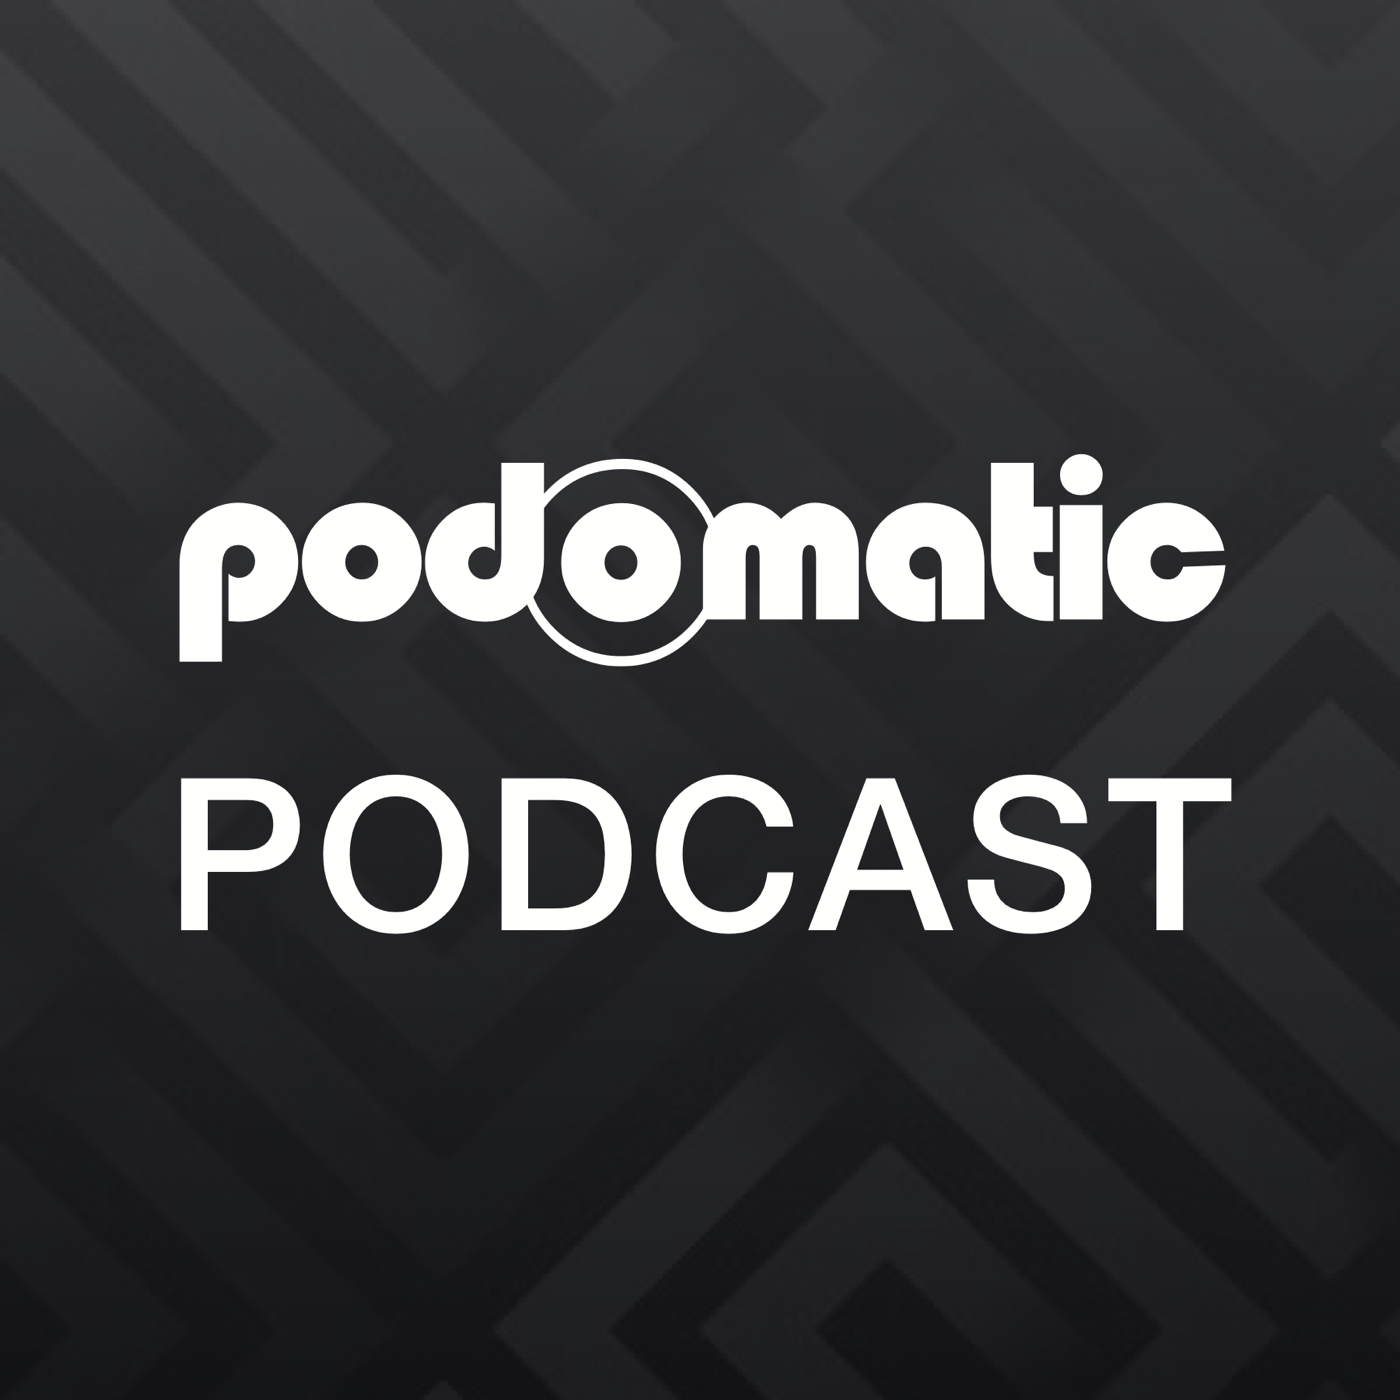 coreyjrutherford@gmail.com's Podcast